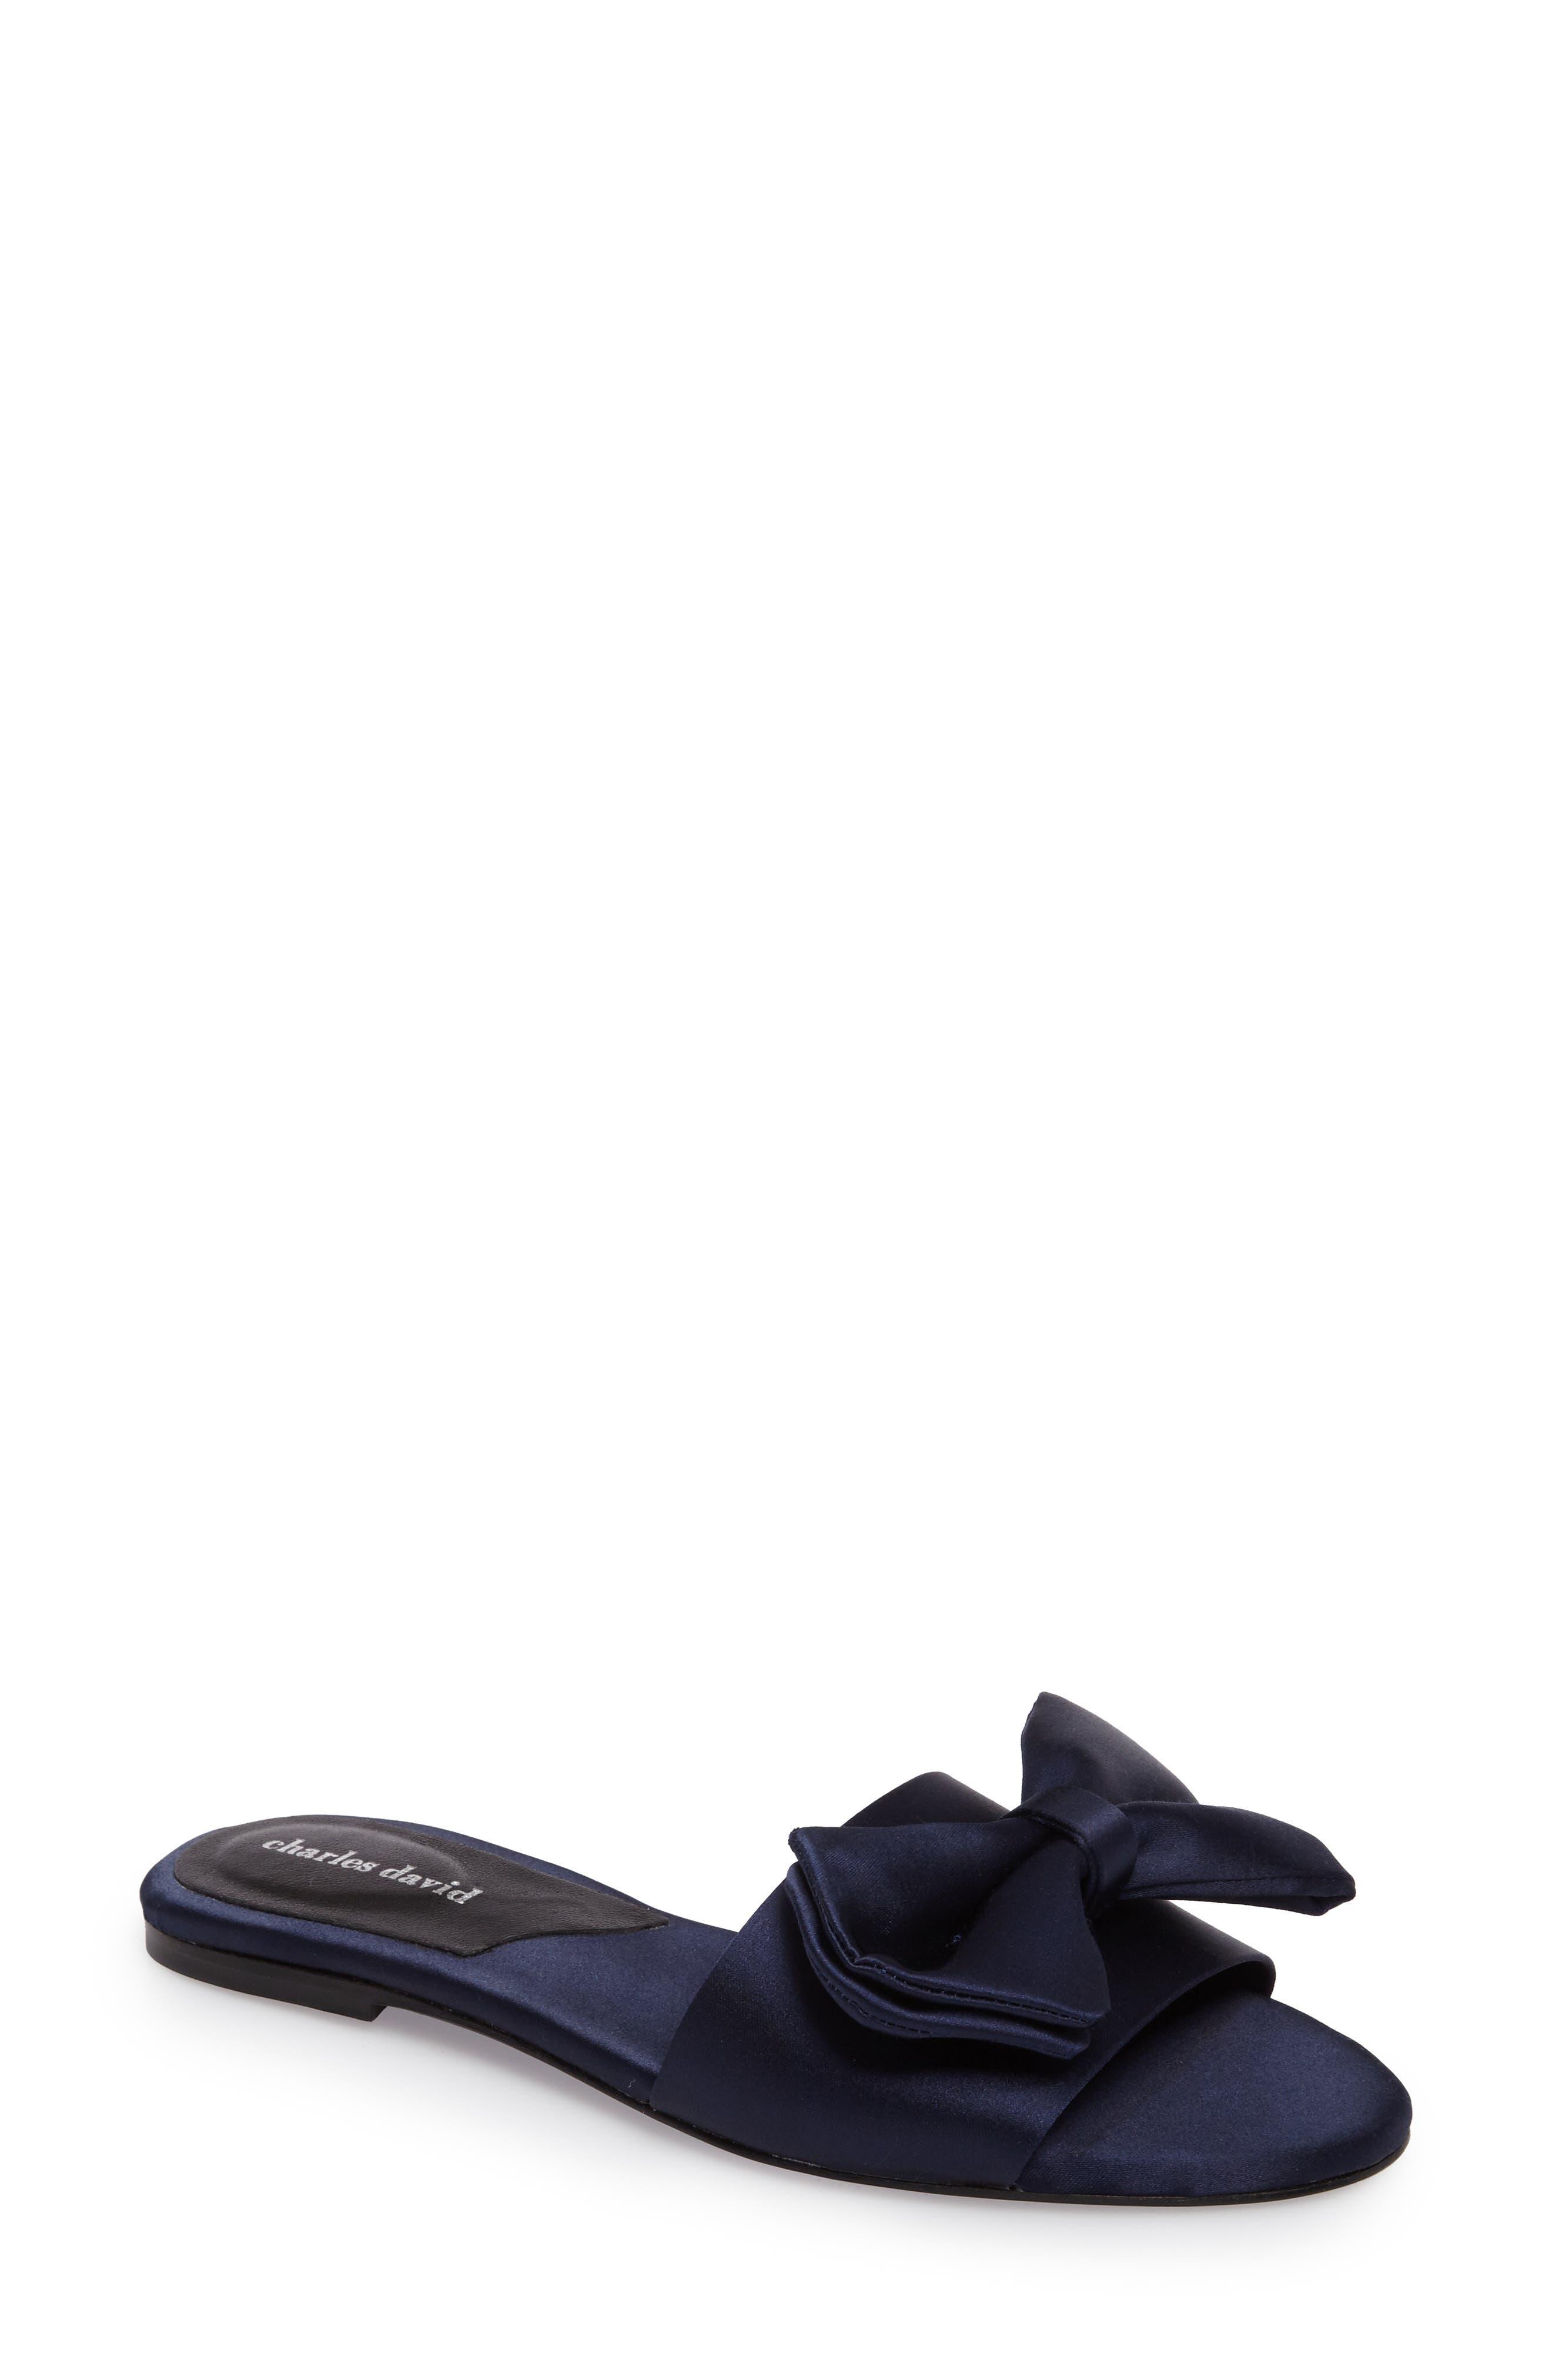 Bow Slide Sandal,                         Main,                         color, NAVY SATIN